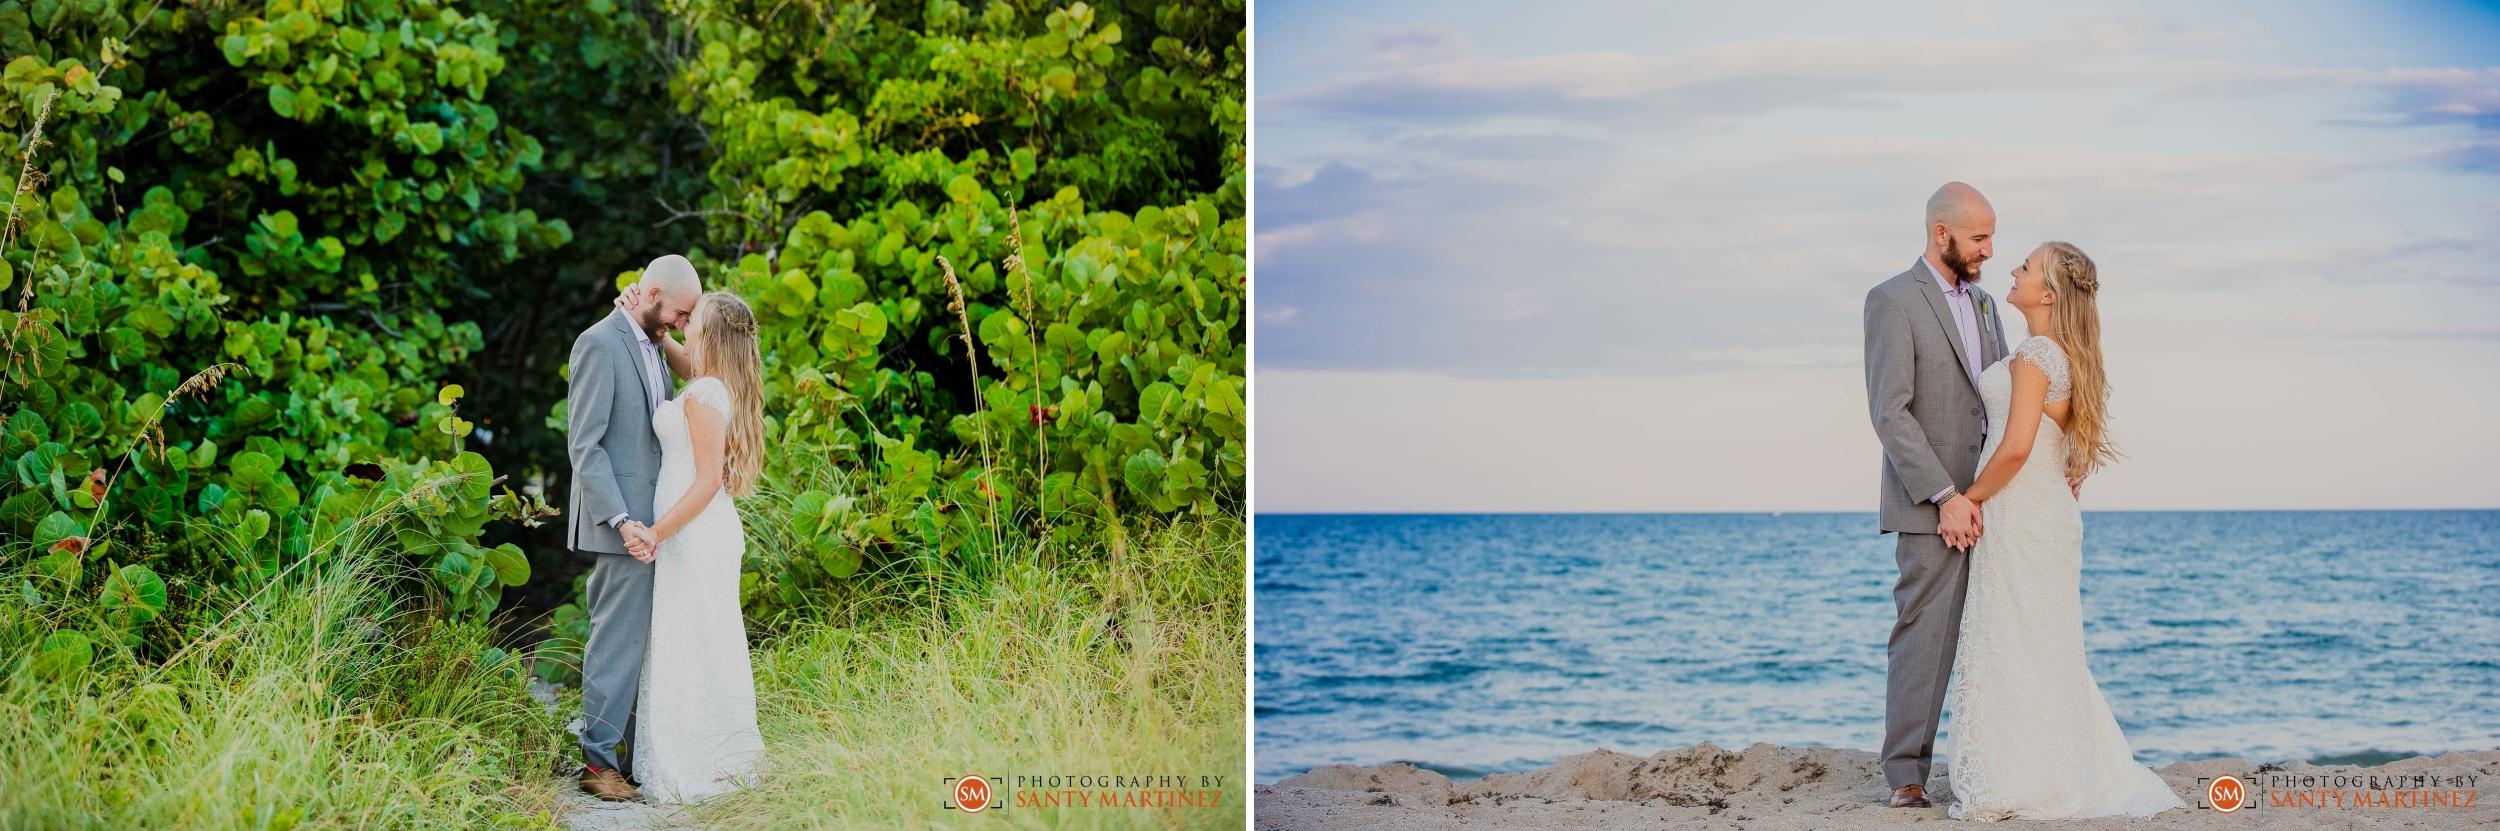 Wedding - Seagate Beach Club - Hotel - Delray Beach - Santy Martinez Photography 6.jpg